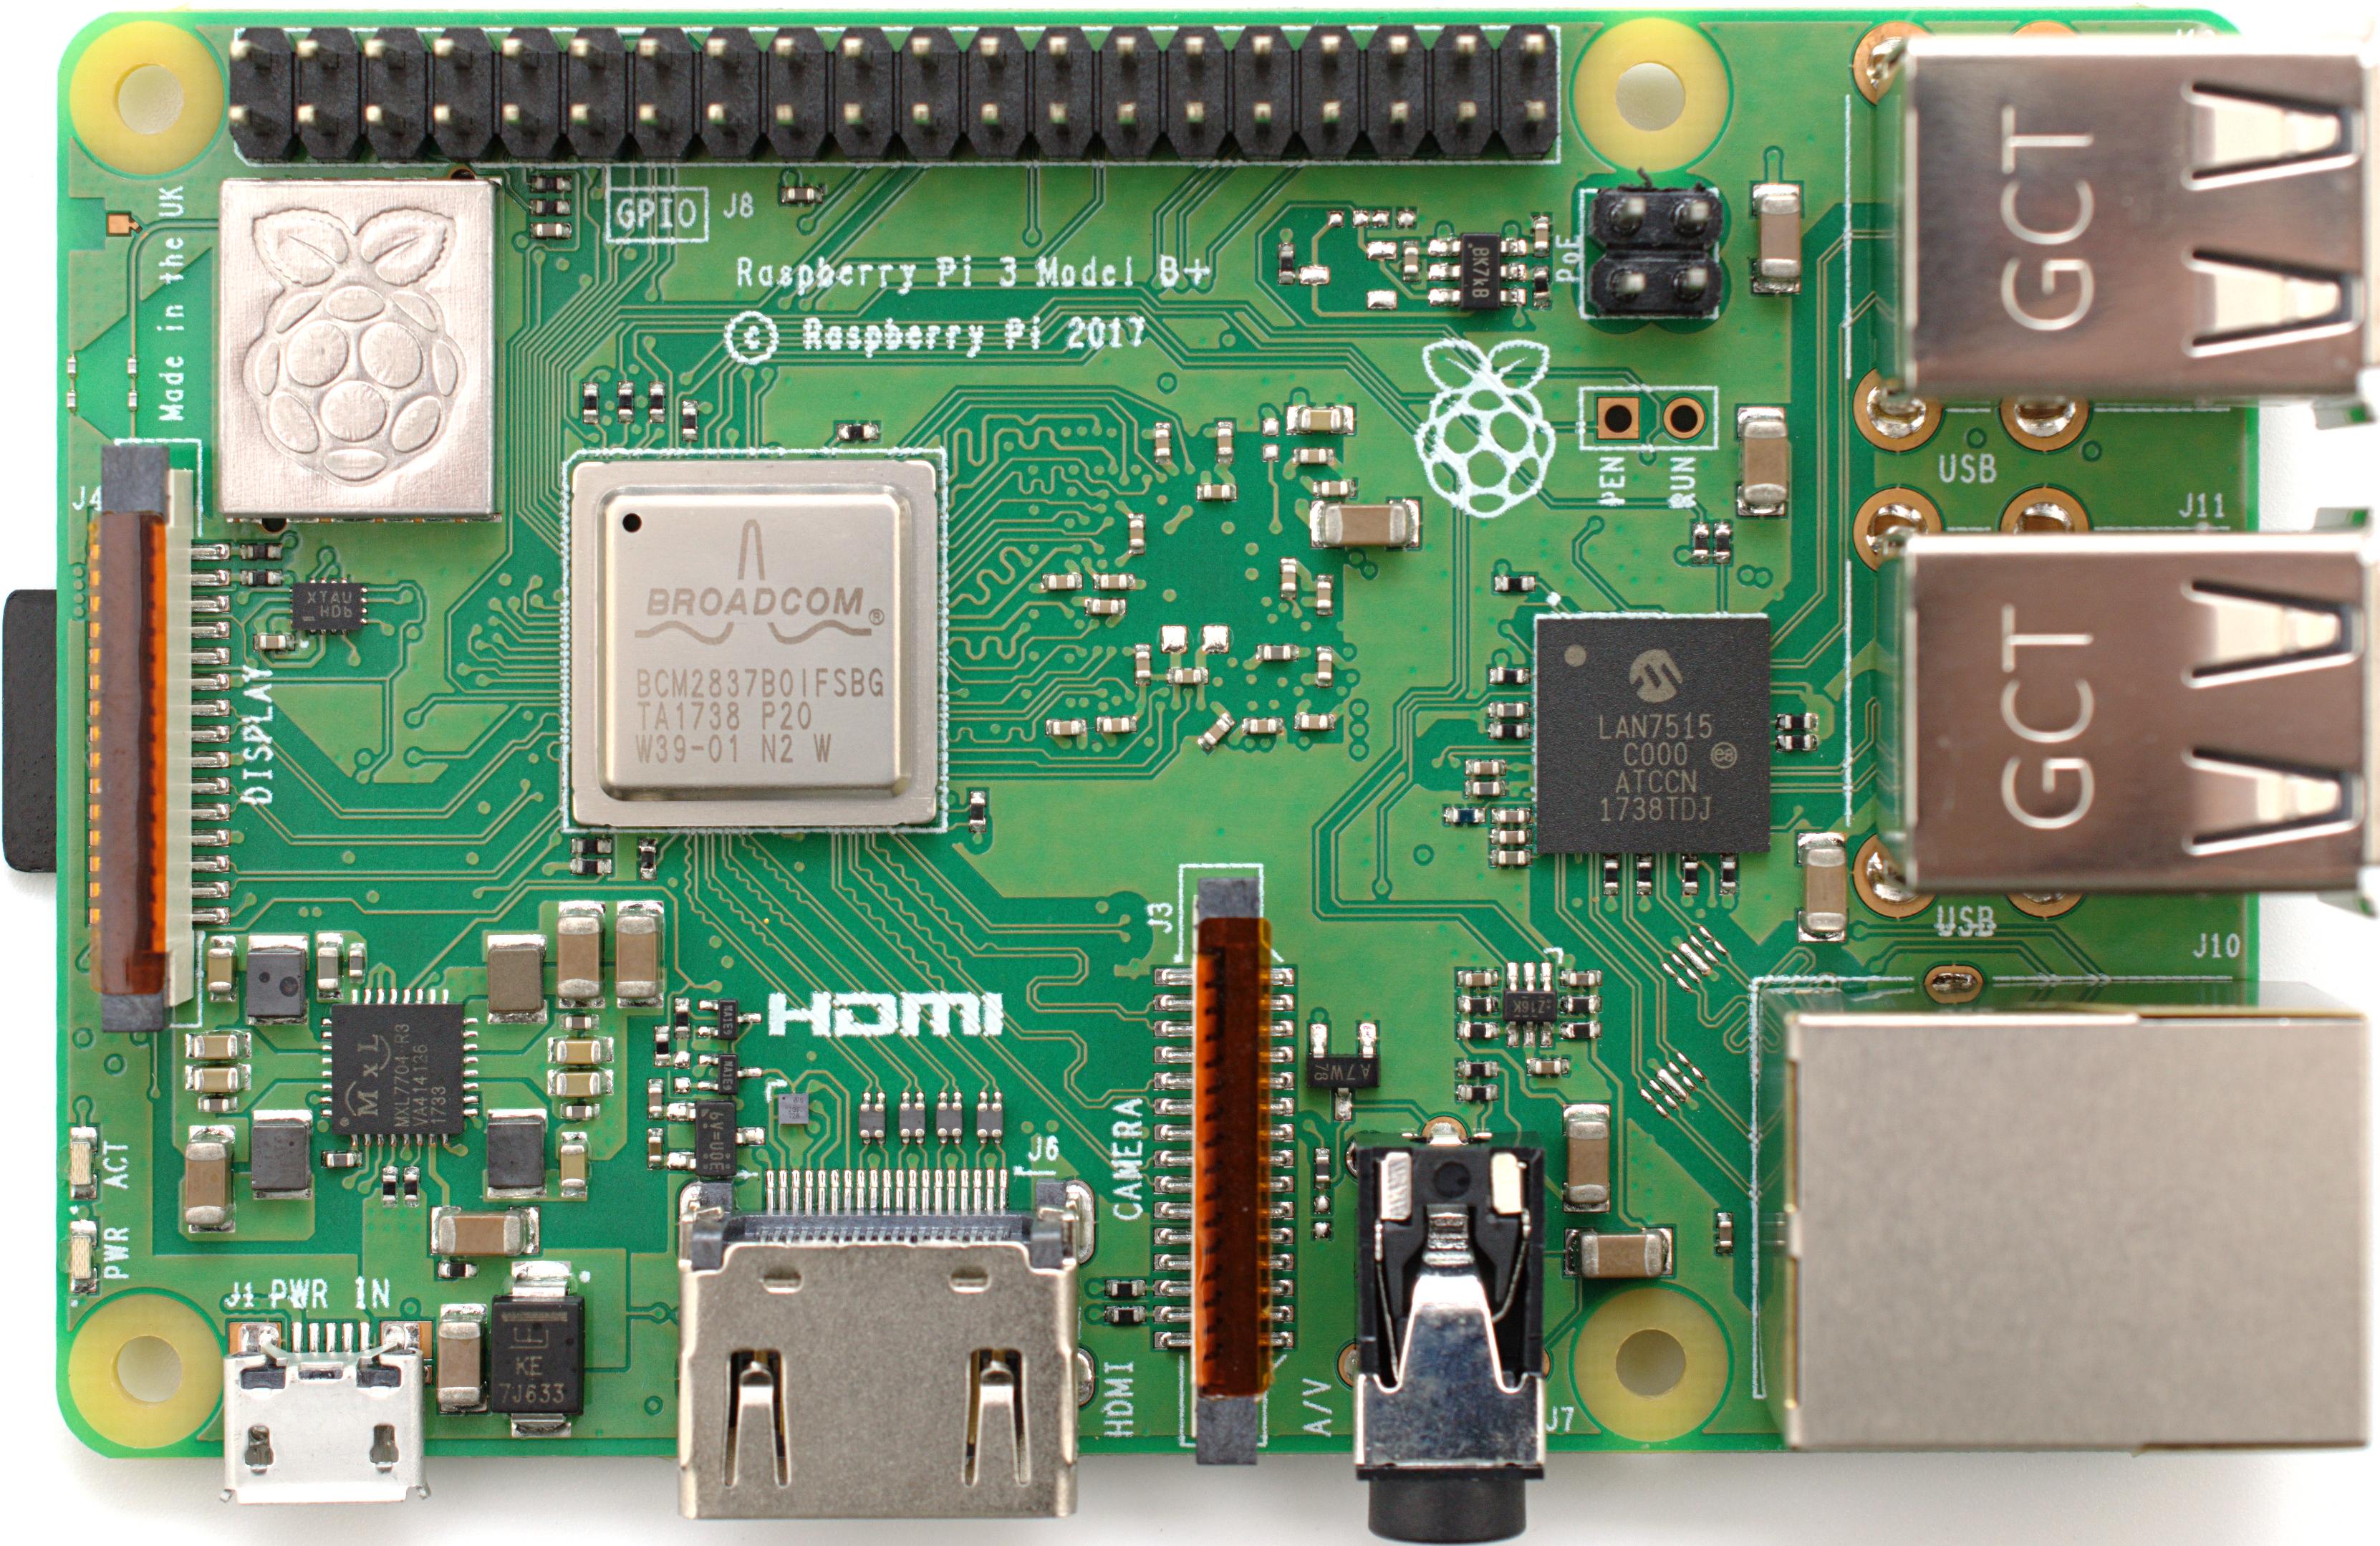 SMSC LAN9514 Ethernet Adapter Drivers Mac